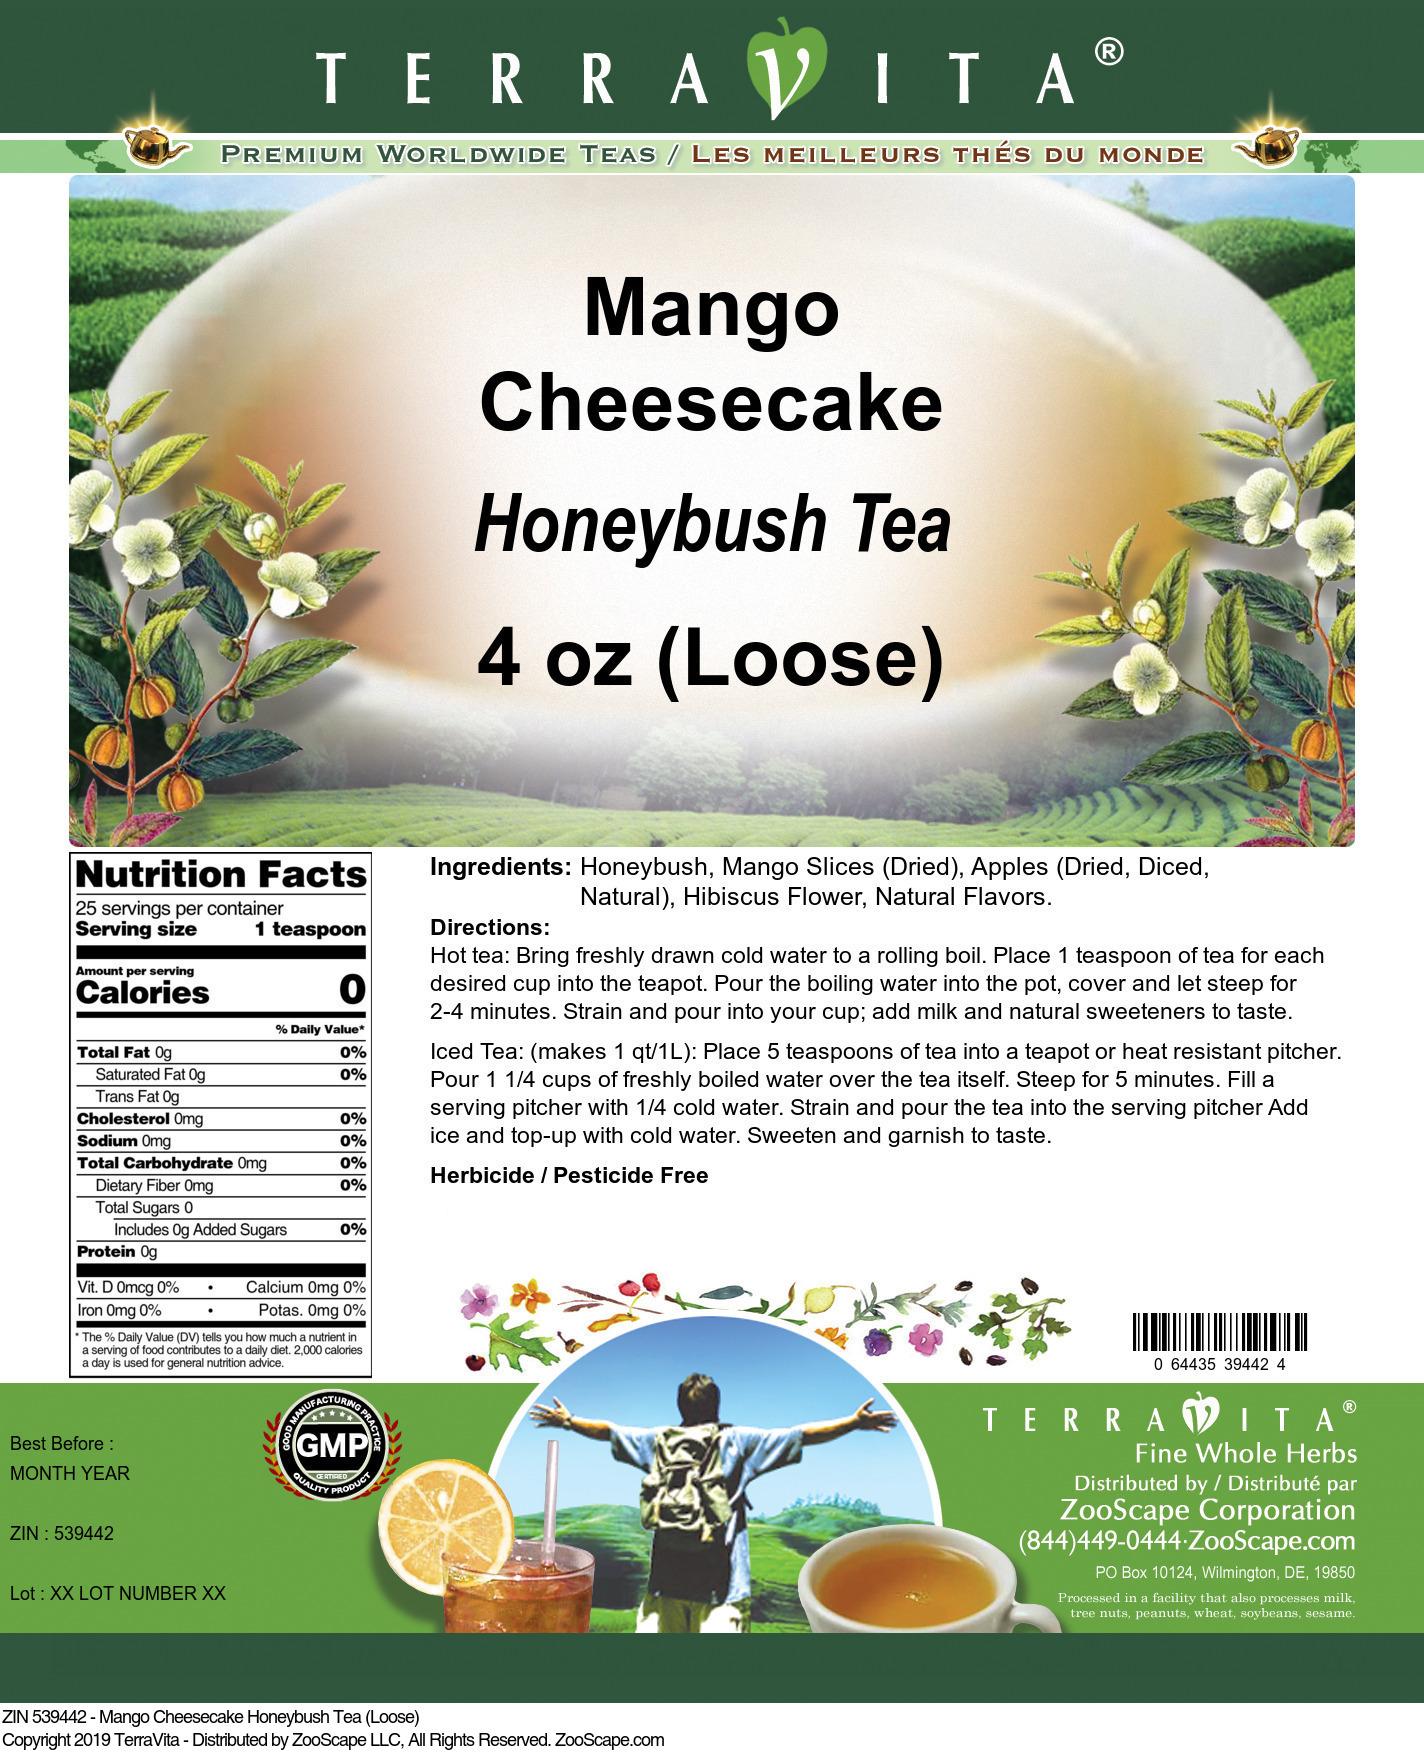 Mango Cheesecake Honeybush Tea (Loose)